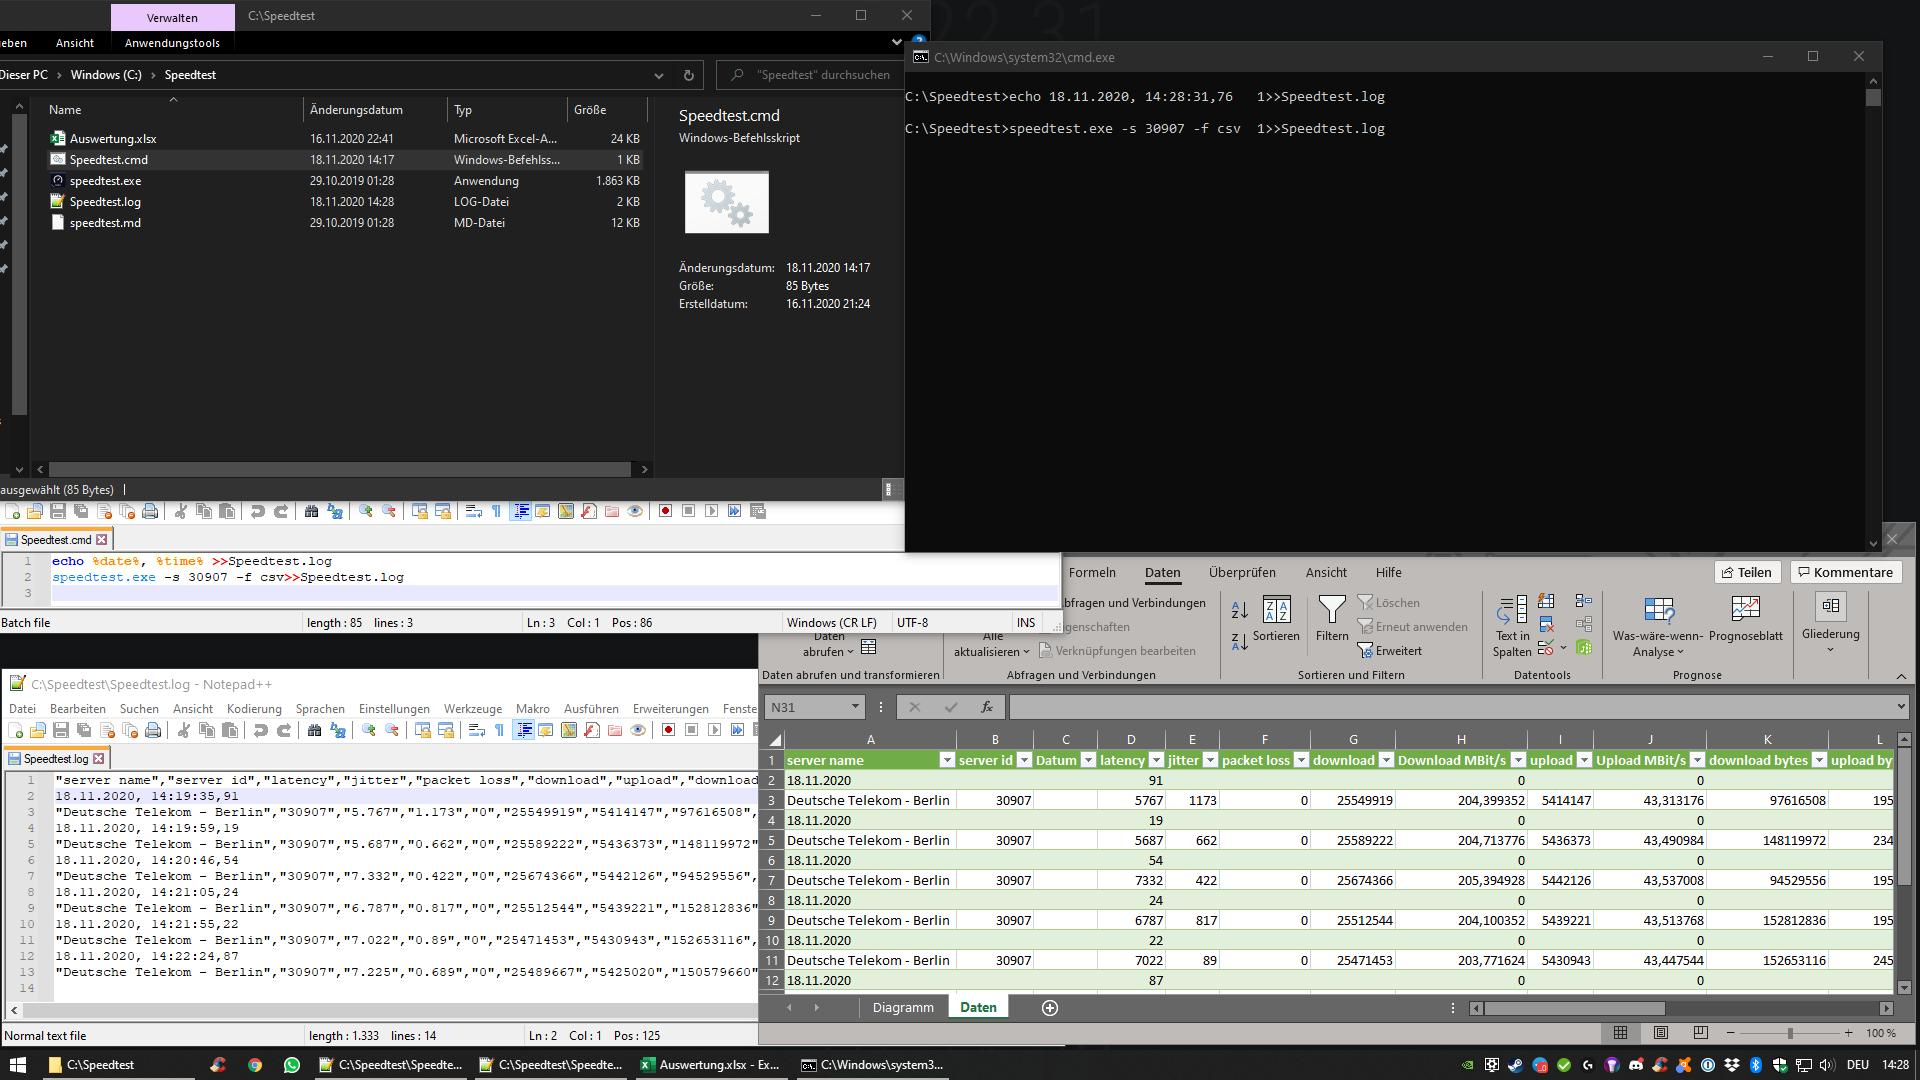 Screenshot 2020-11-18 14.28.38.png